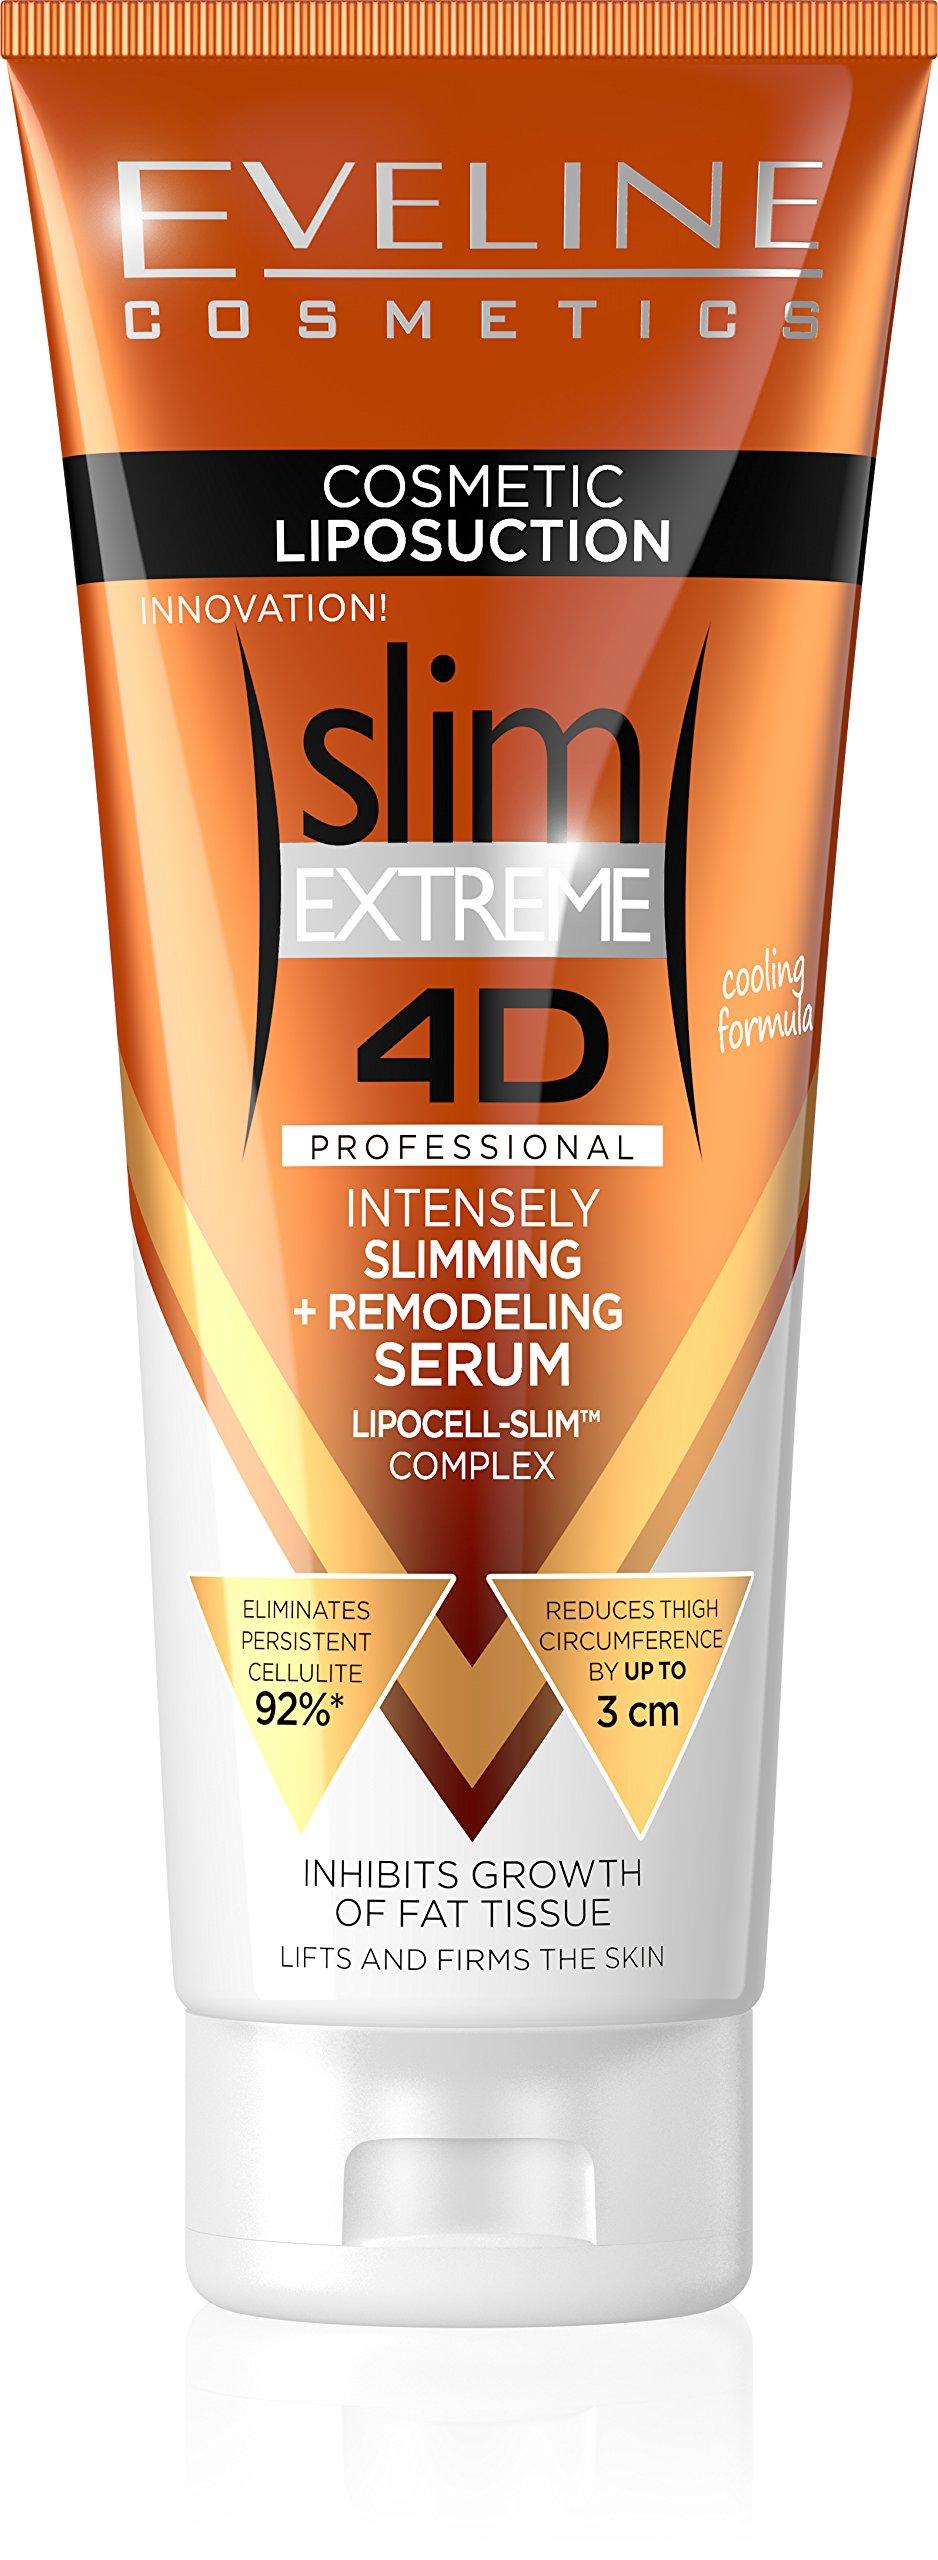 Eveline Slim Extreme 4D Liposuction Body Serum, 8.45 Fluid Ounce